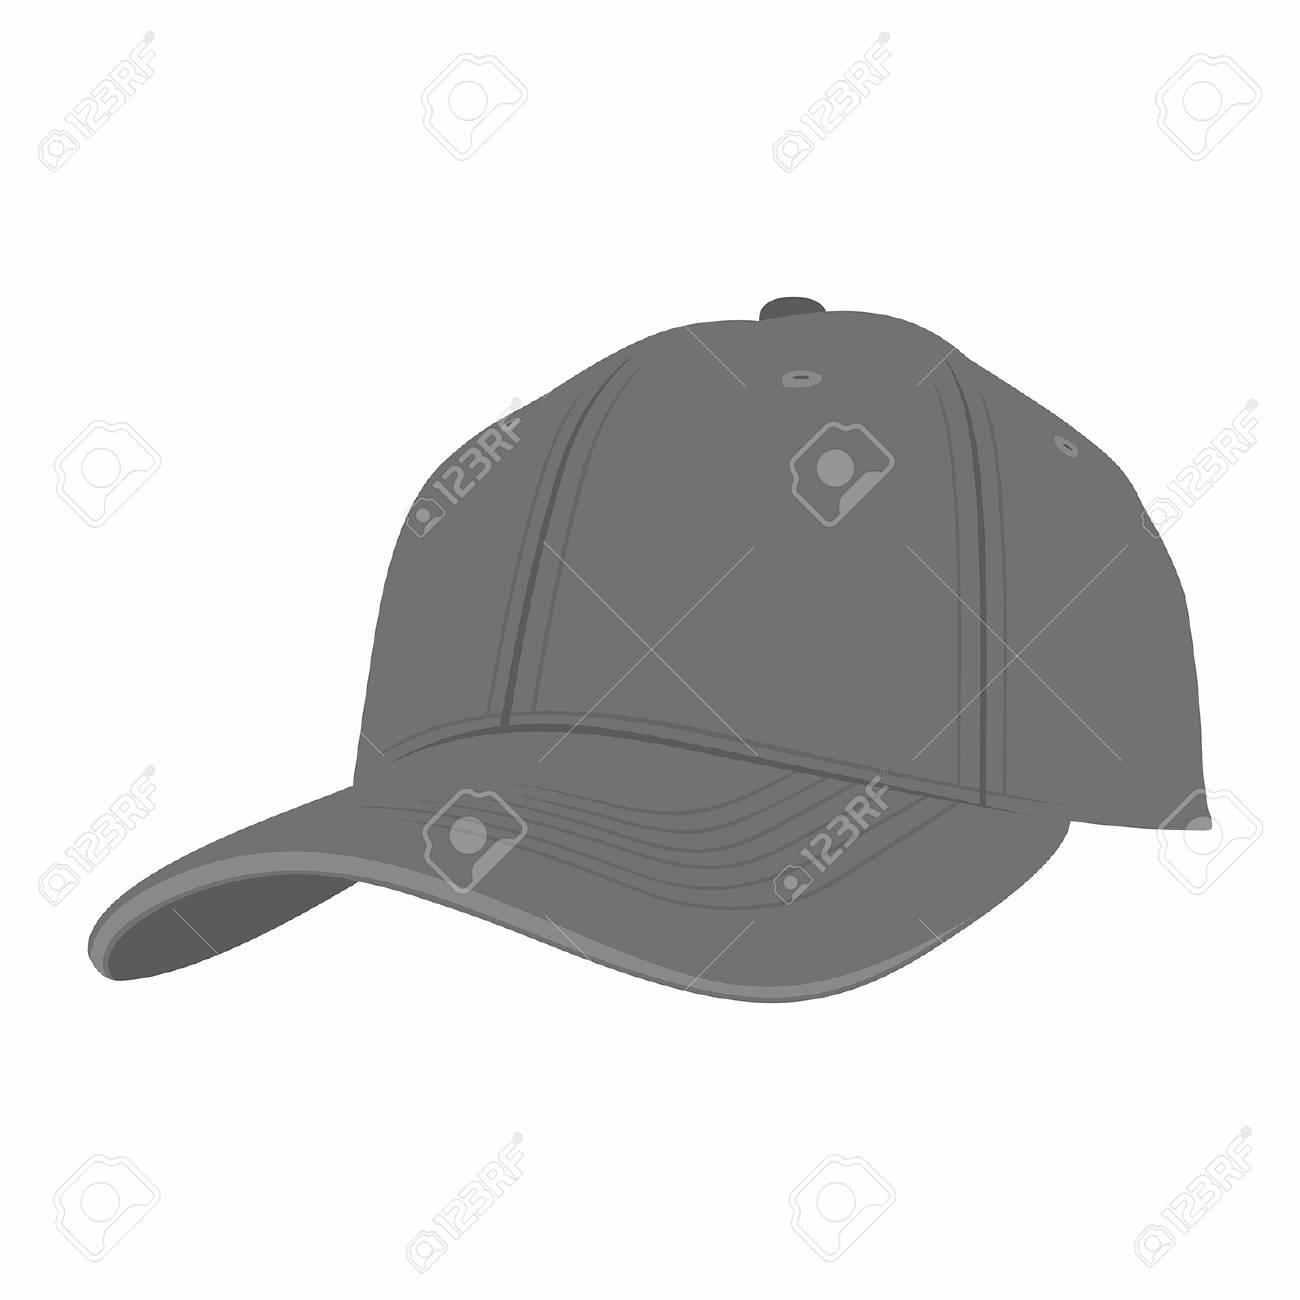 8dfdcd10 Black Baseball Cap isolated on white background Stock Vector - 95158413